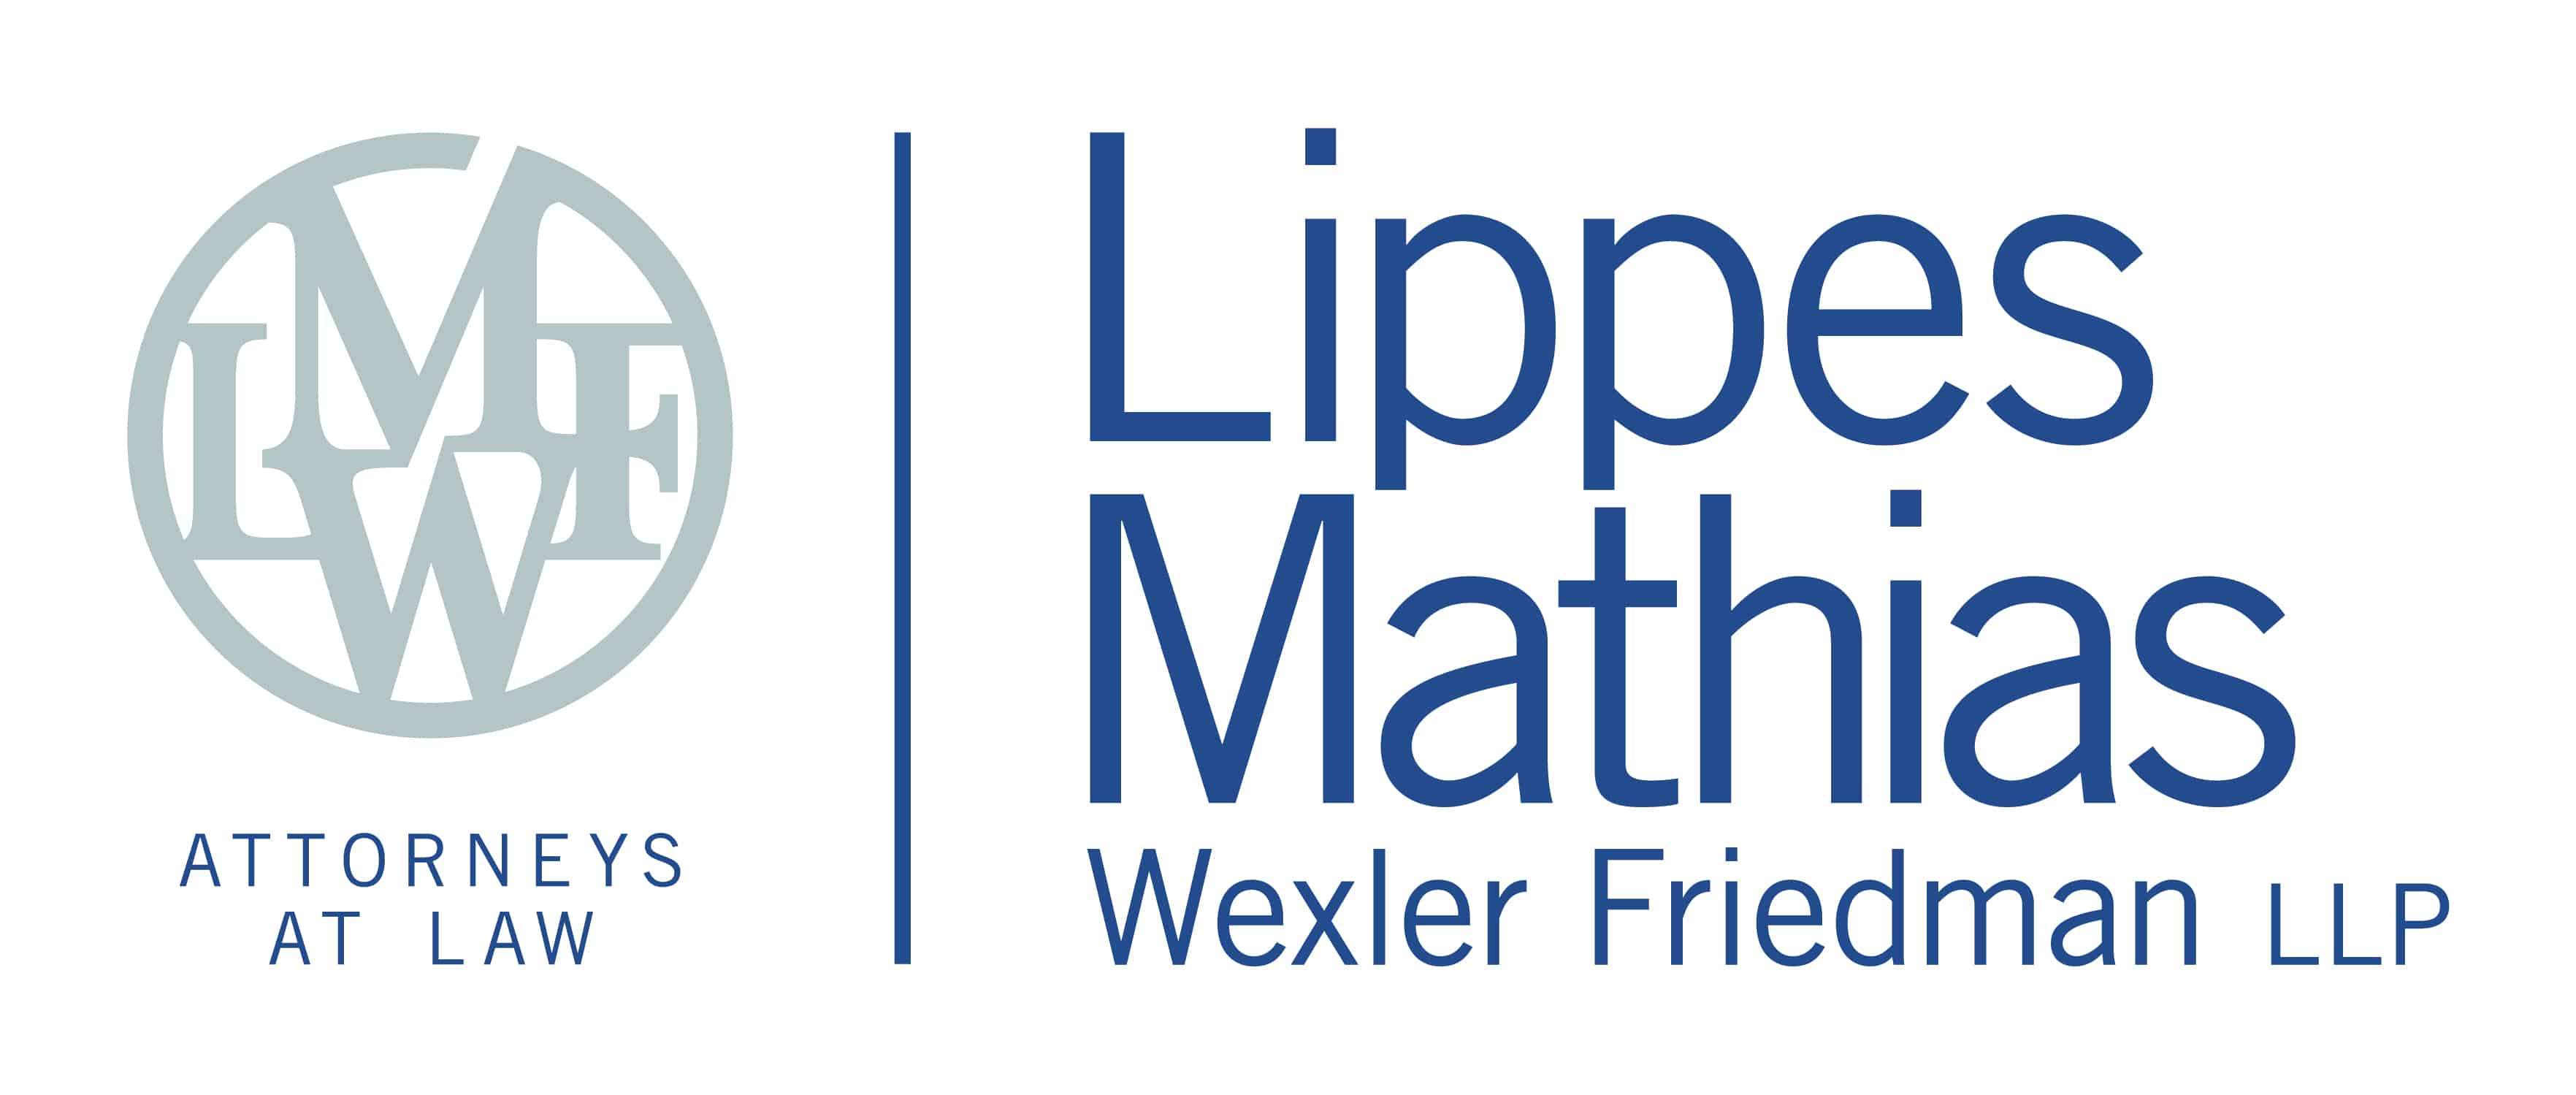 Lippes Mathias Wexler Friedman